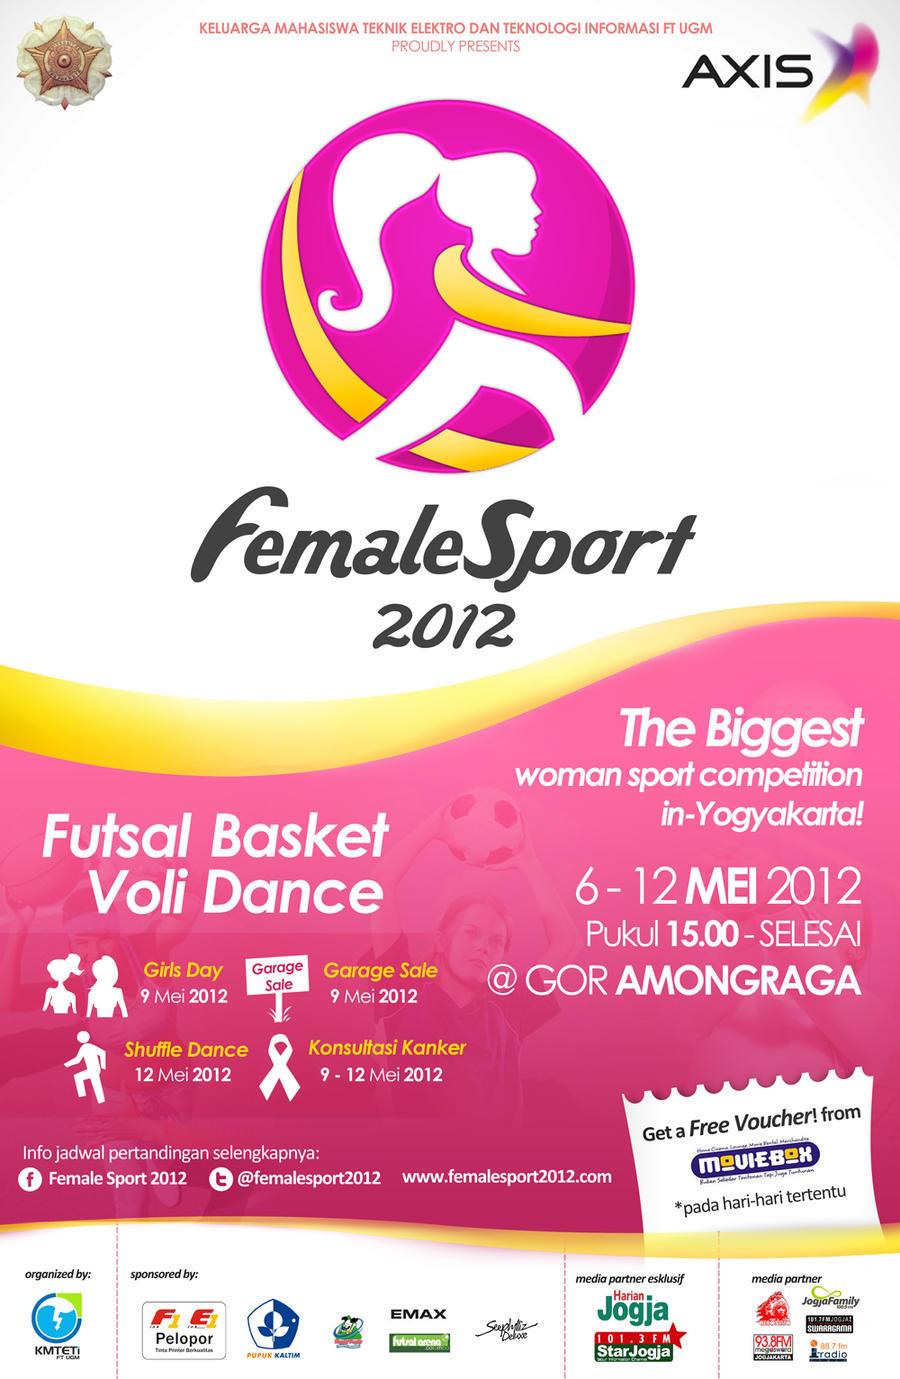 Female Sport Baliho by suicidekills